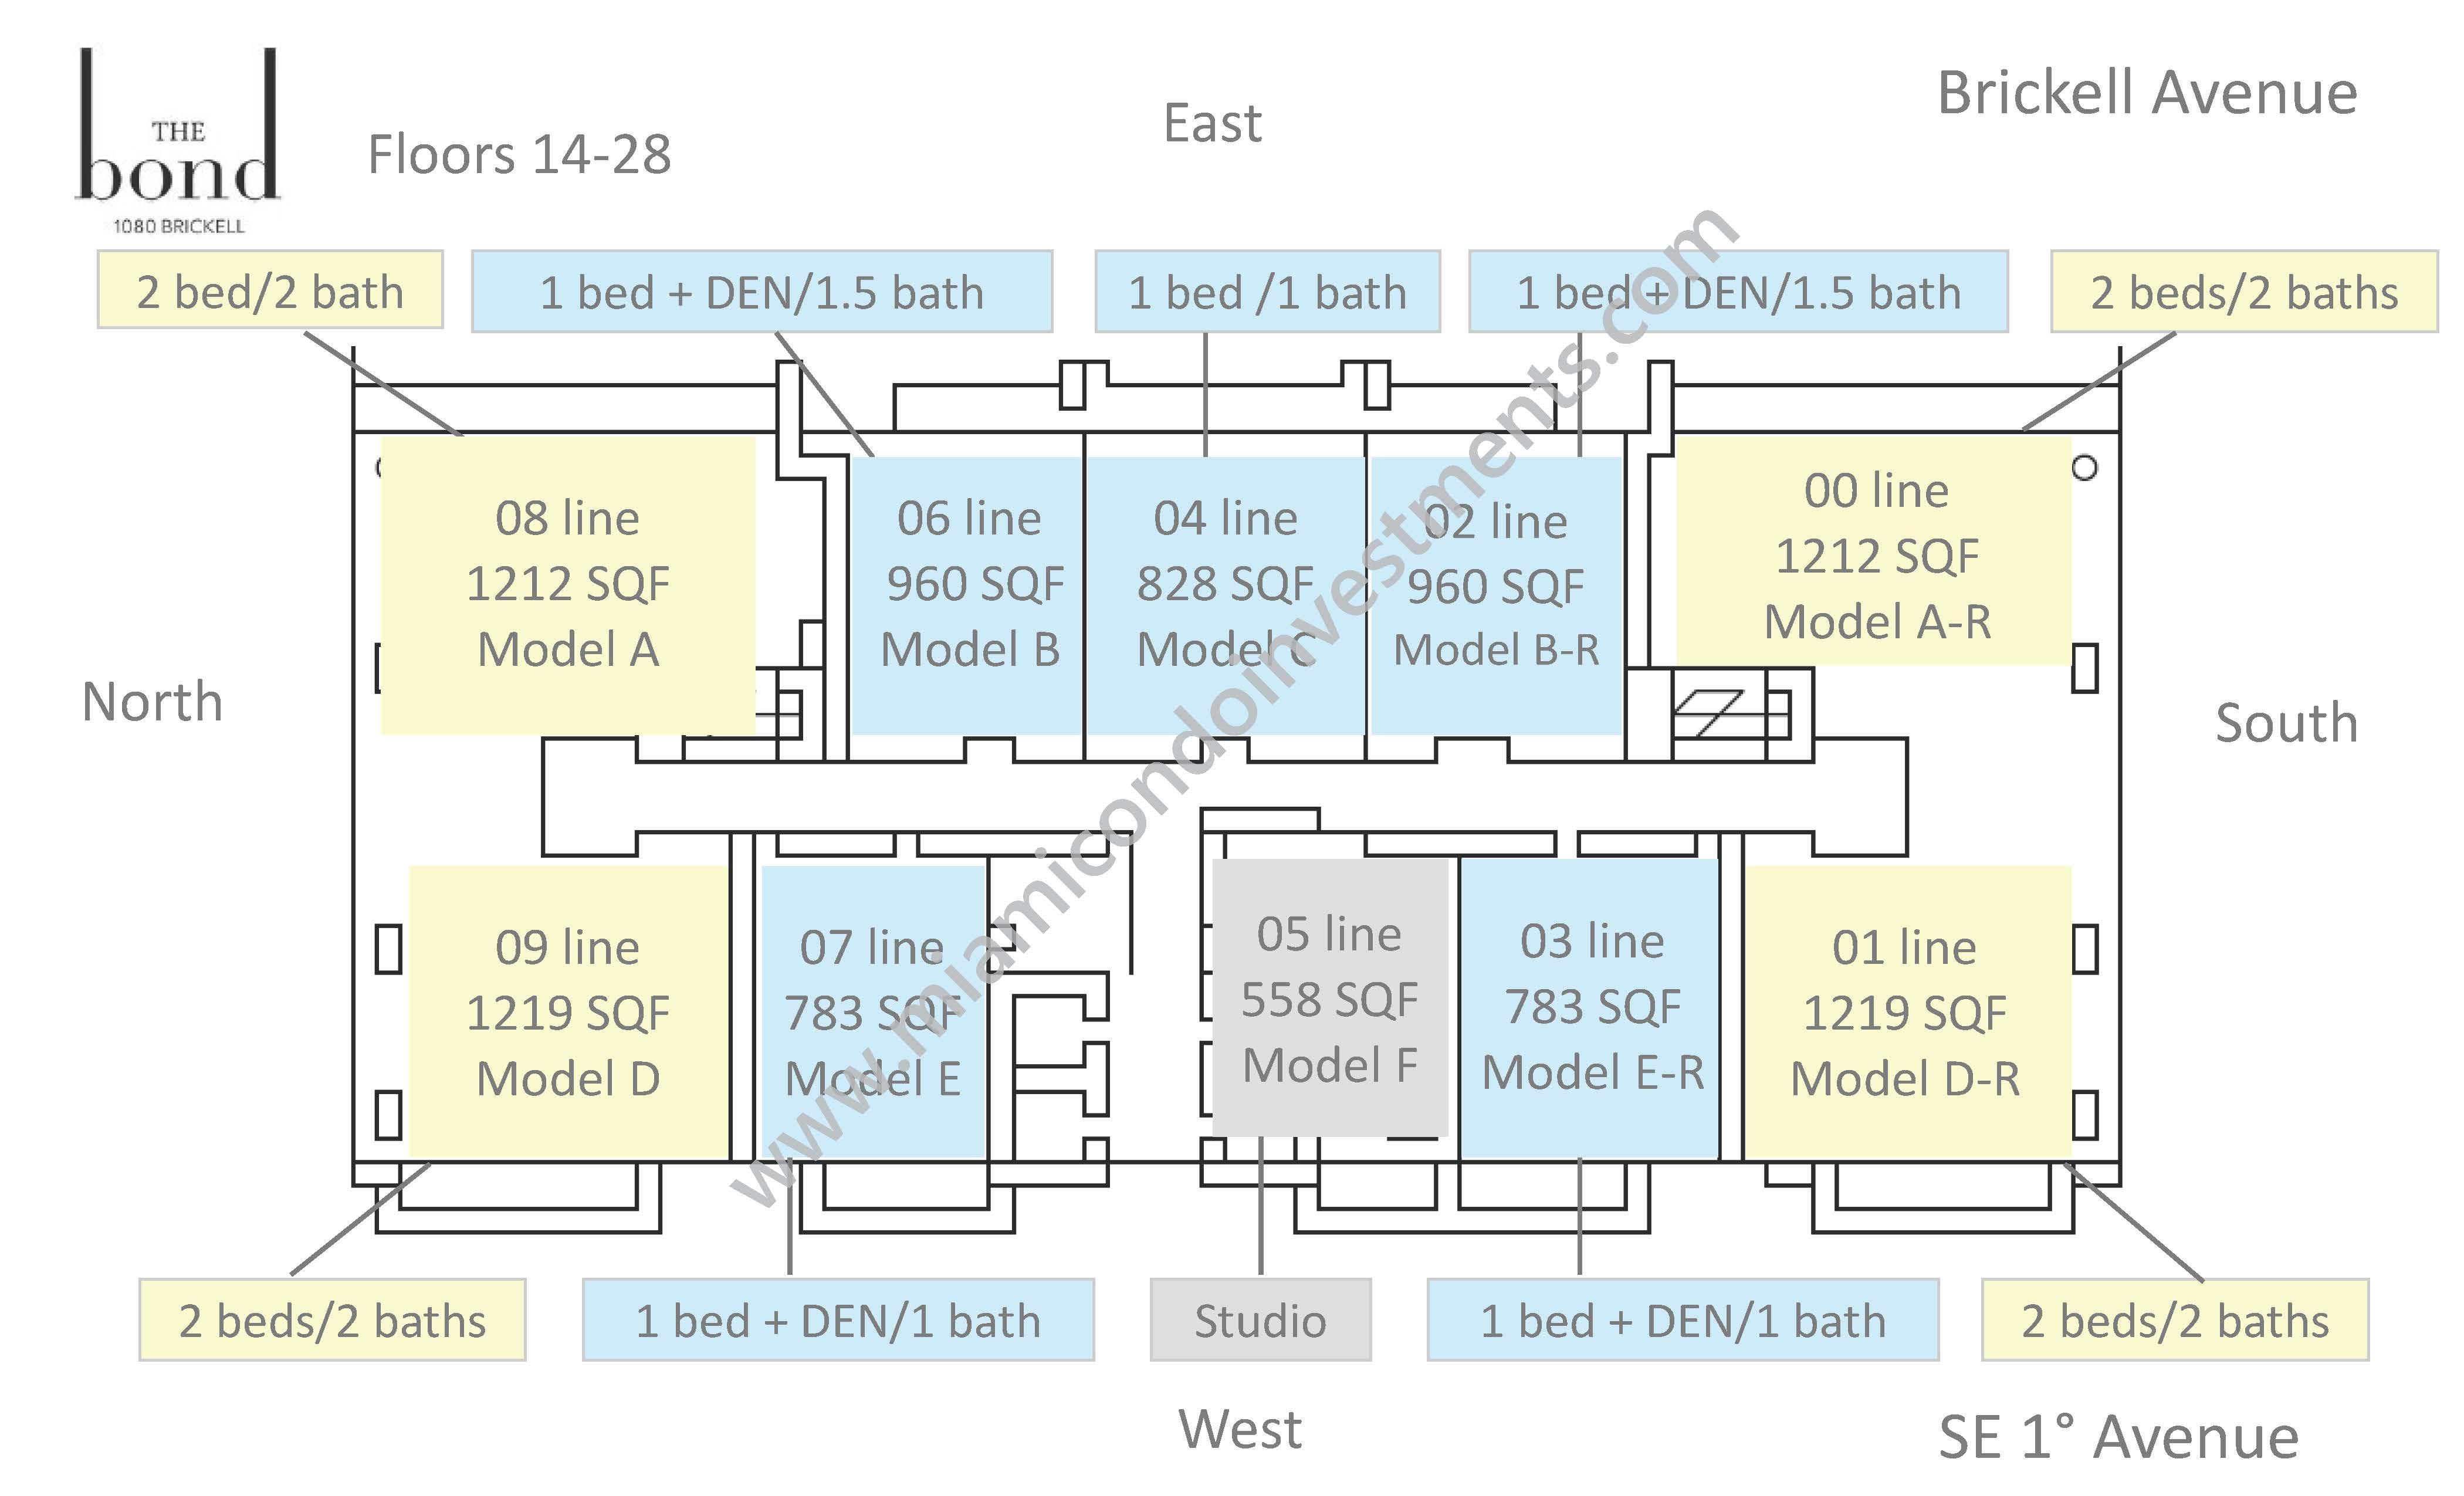 the-bond-on-brickell-key-plan-floors-14-to-28-wm